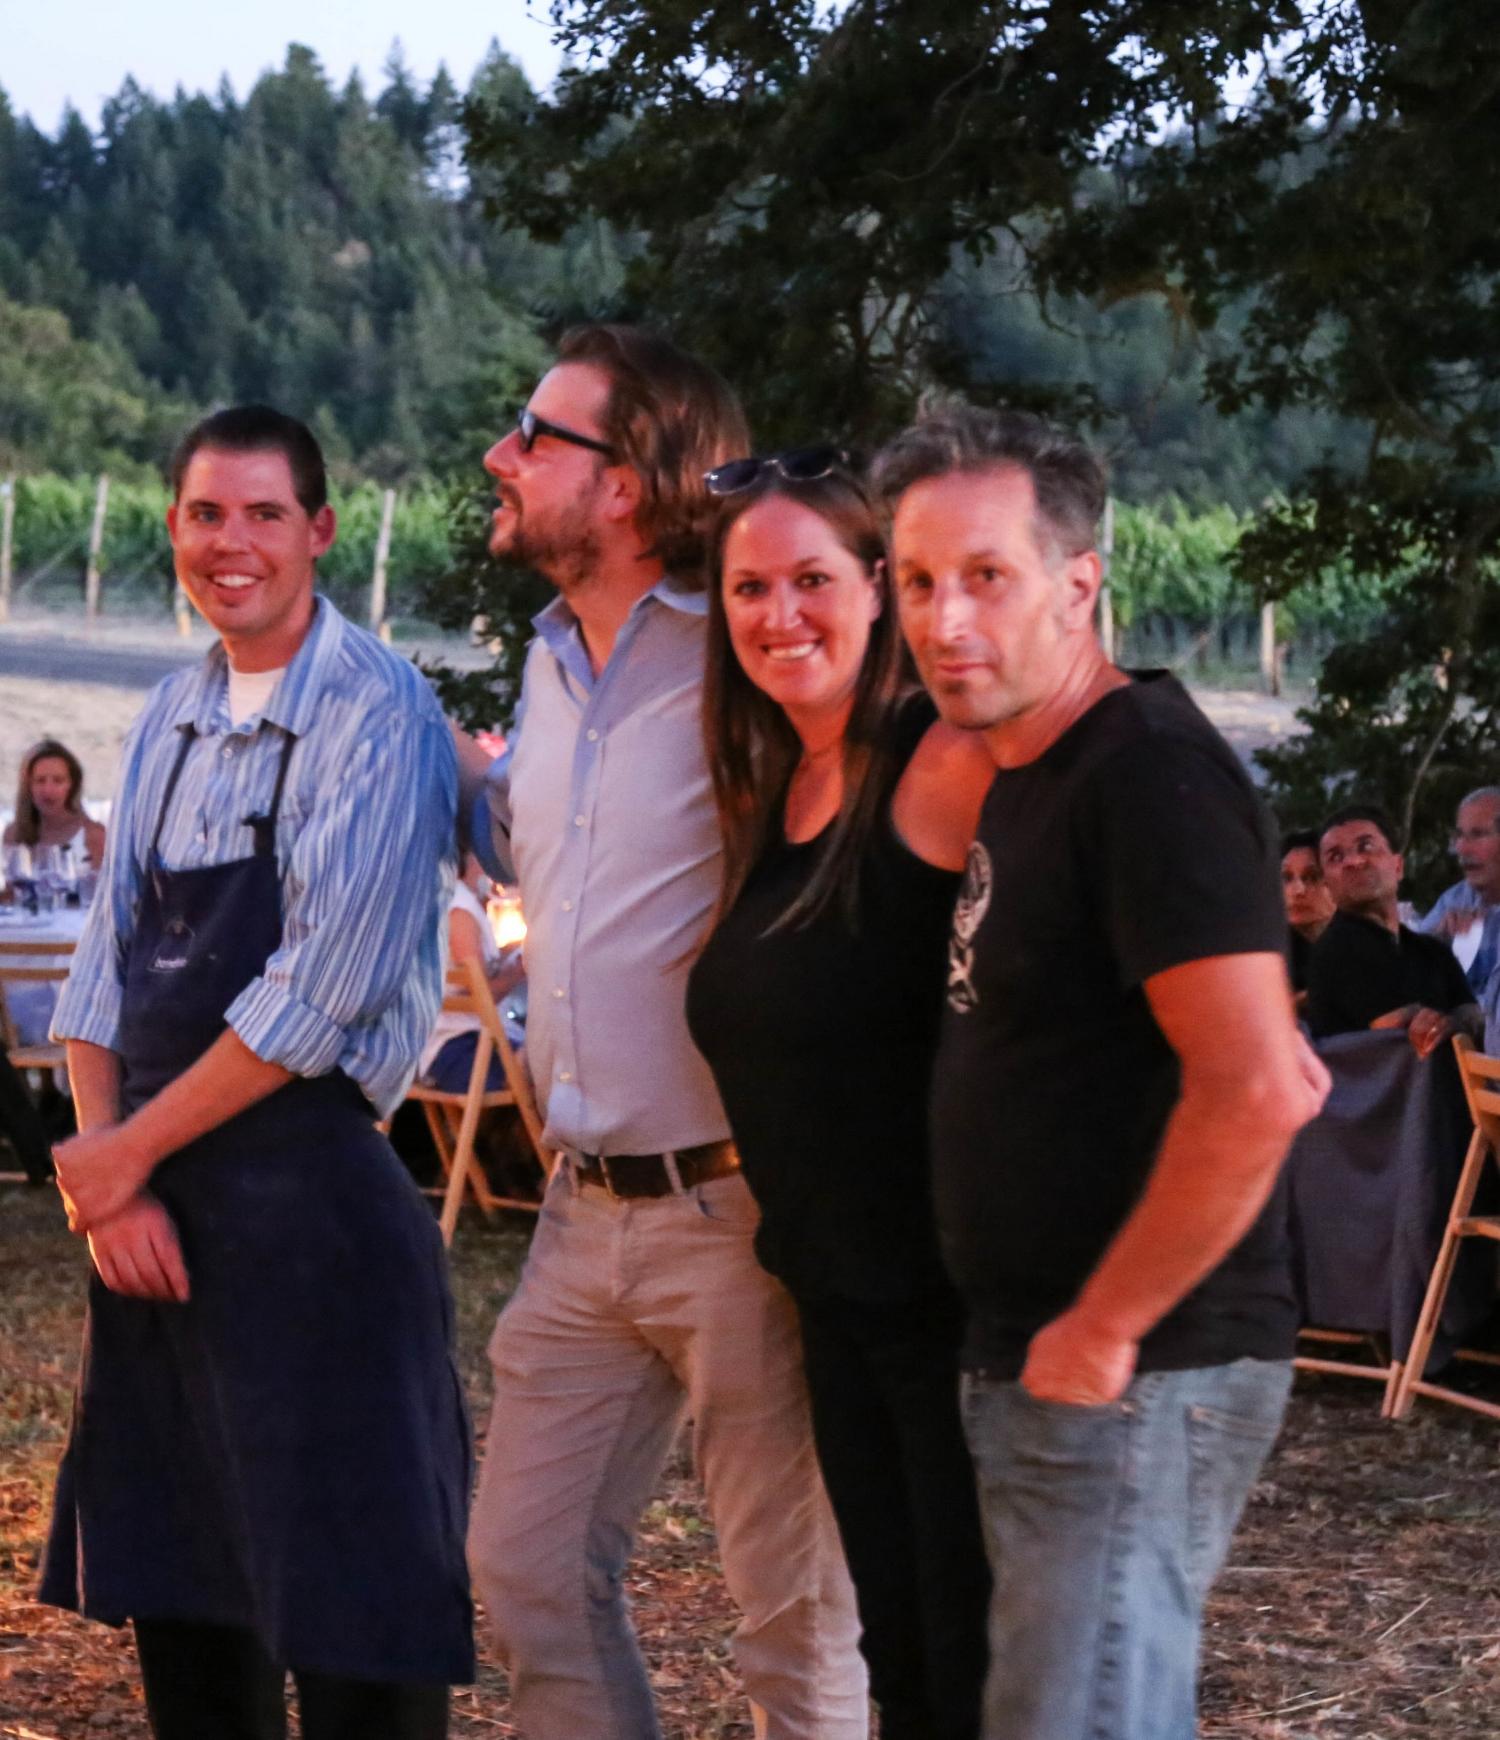 Chef Andrew Wycoff, owner Lukka Feldman, restaurant manager Cathryn Hulsman, artist Jordy Morgan, aka HOBO grill master extraordinaire